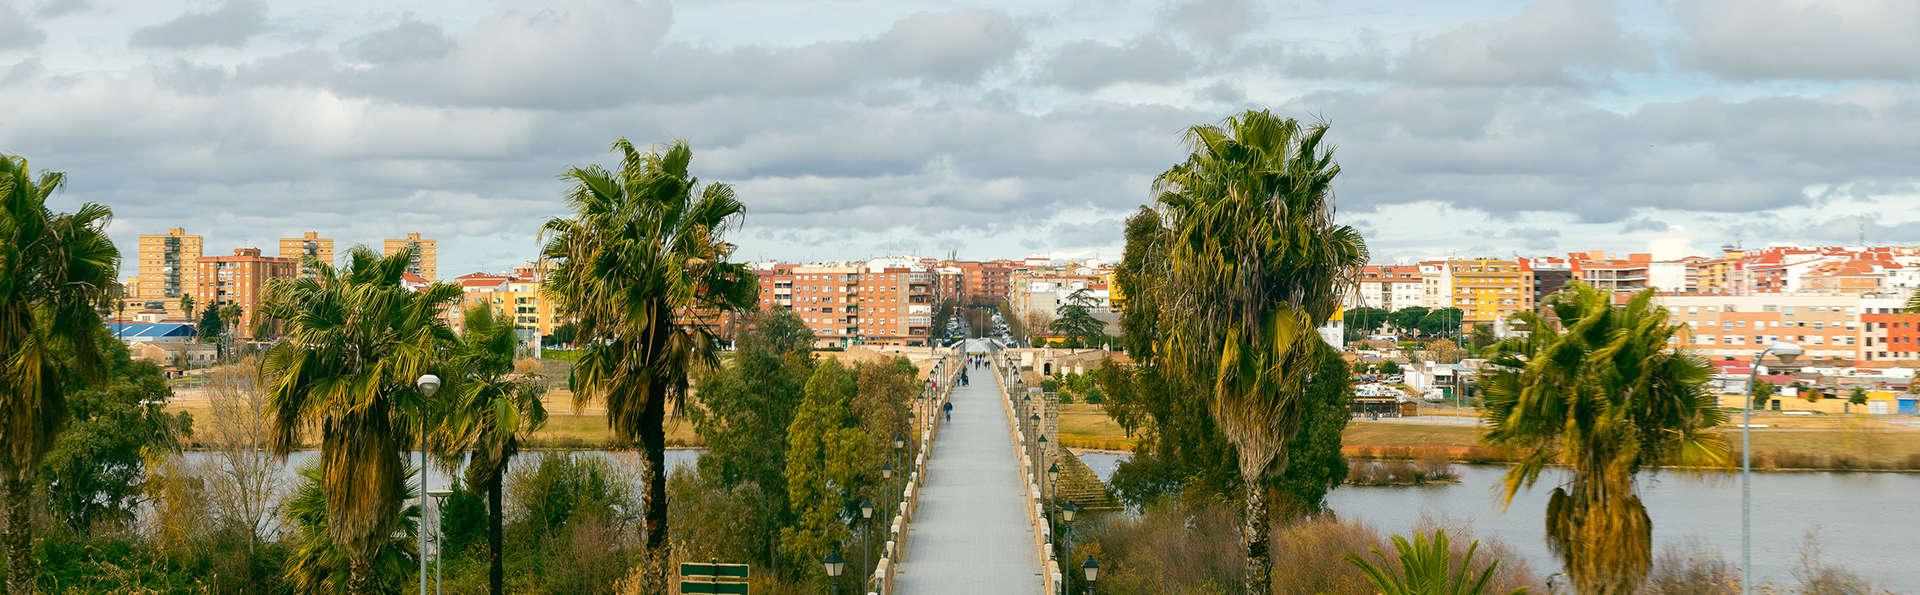 Hotel Balneario El Raposo - EDIT_Destination_Badajoz1.jpg